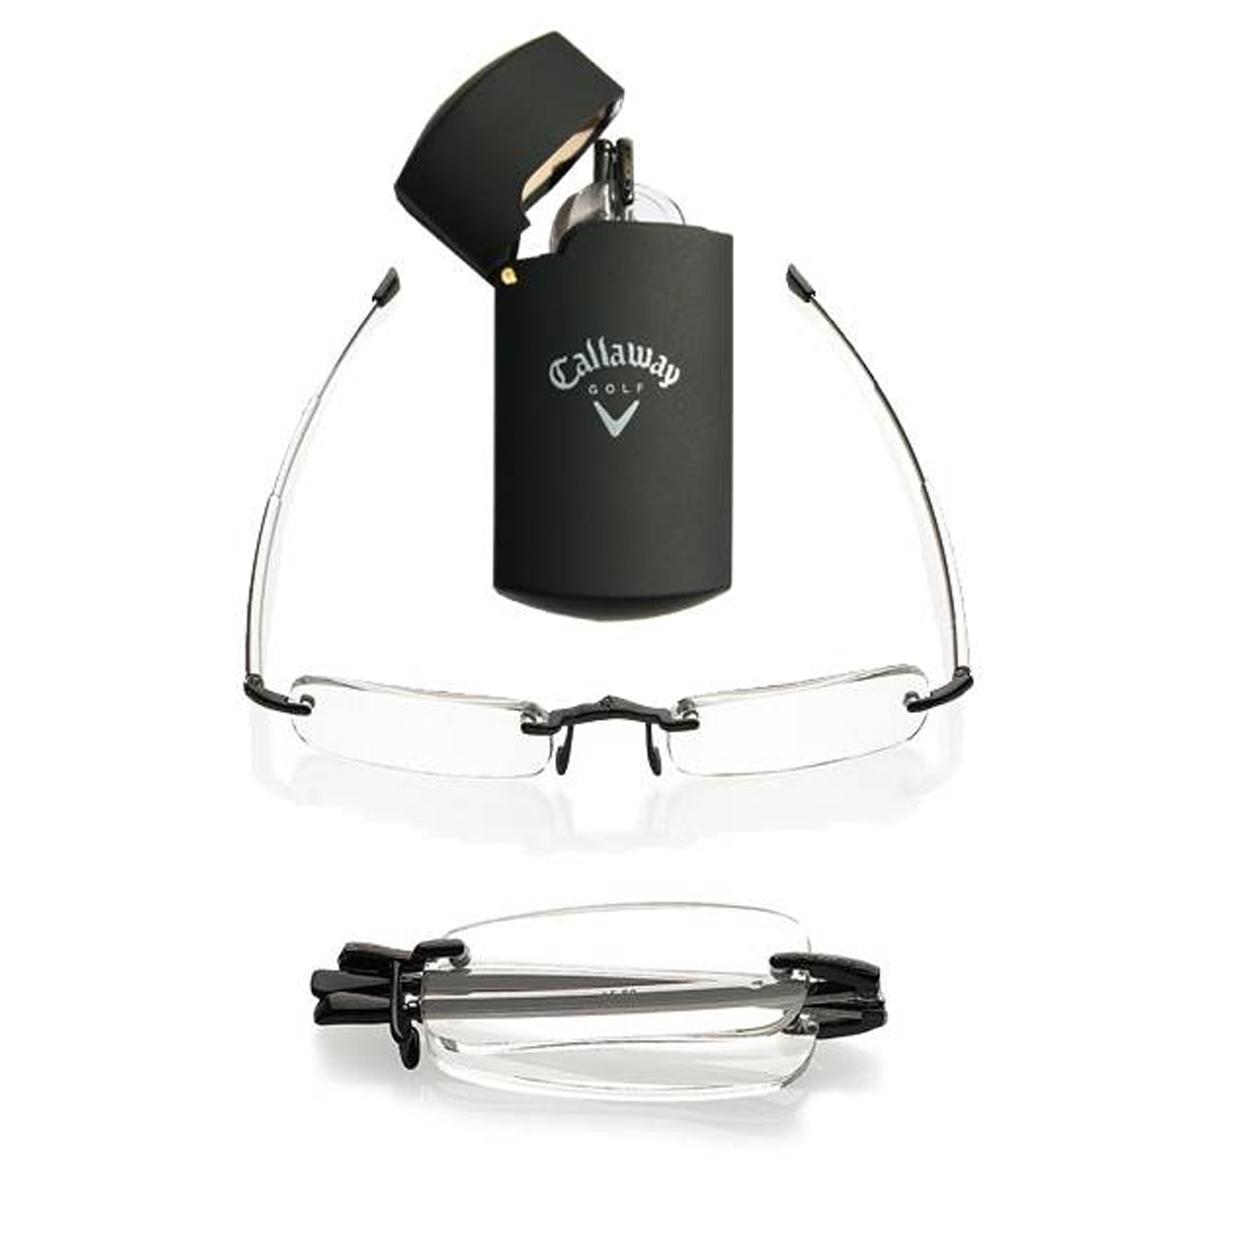 callaway compact reader glasses with fliptop